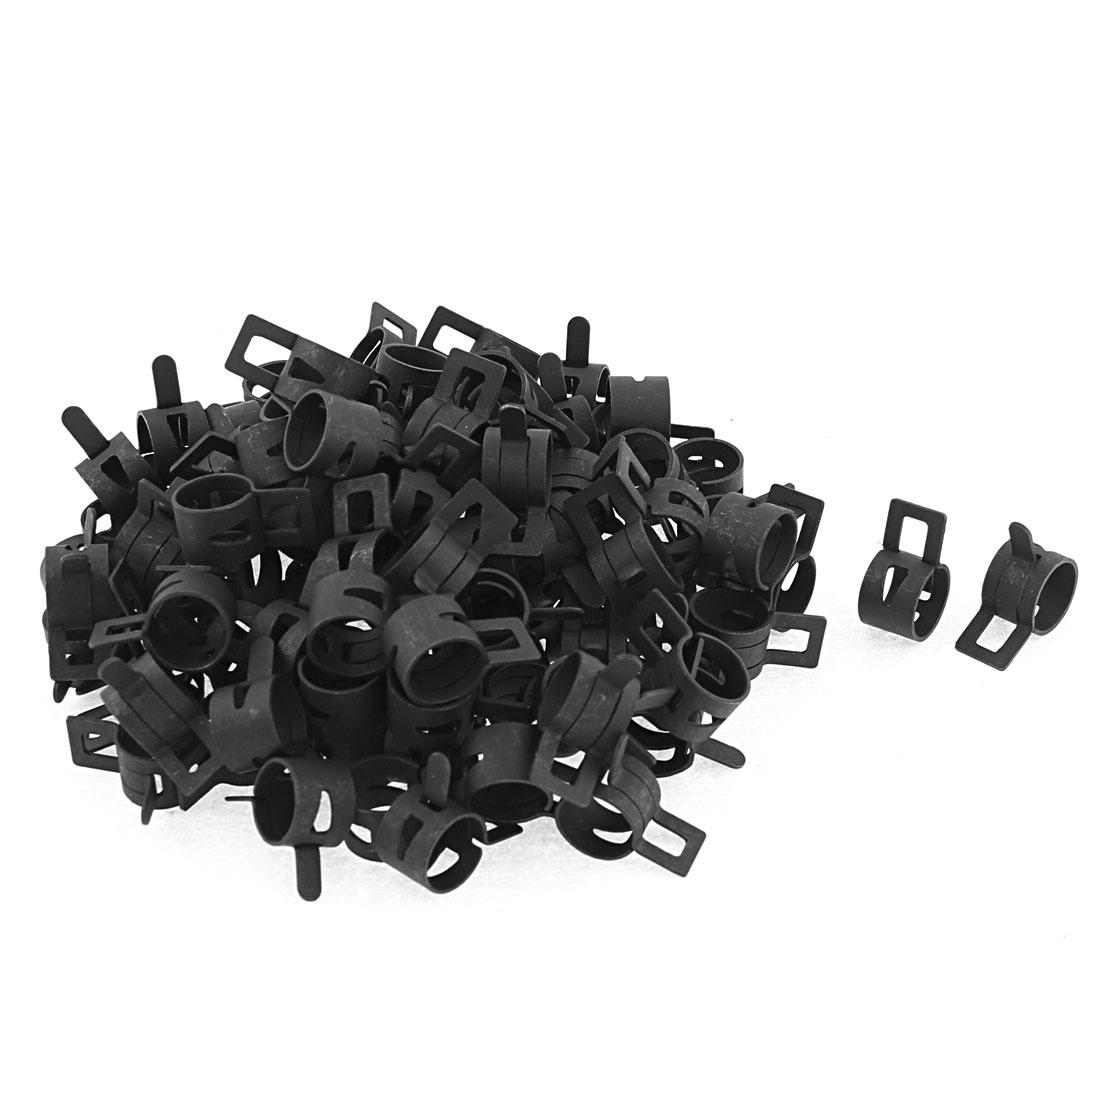 100 Pcs Black Fuel Oil Hose Metal Spring Clip Clamps